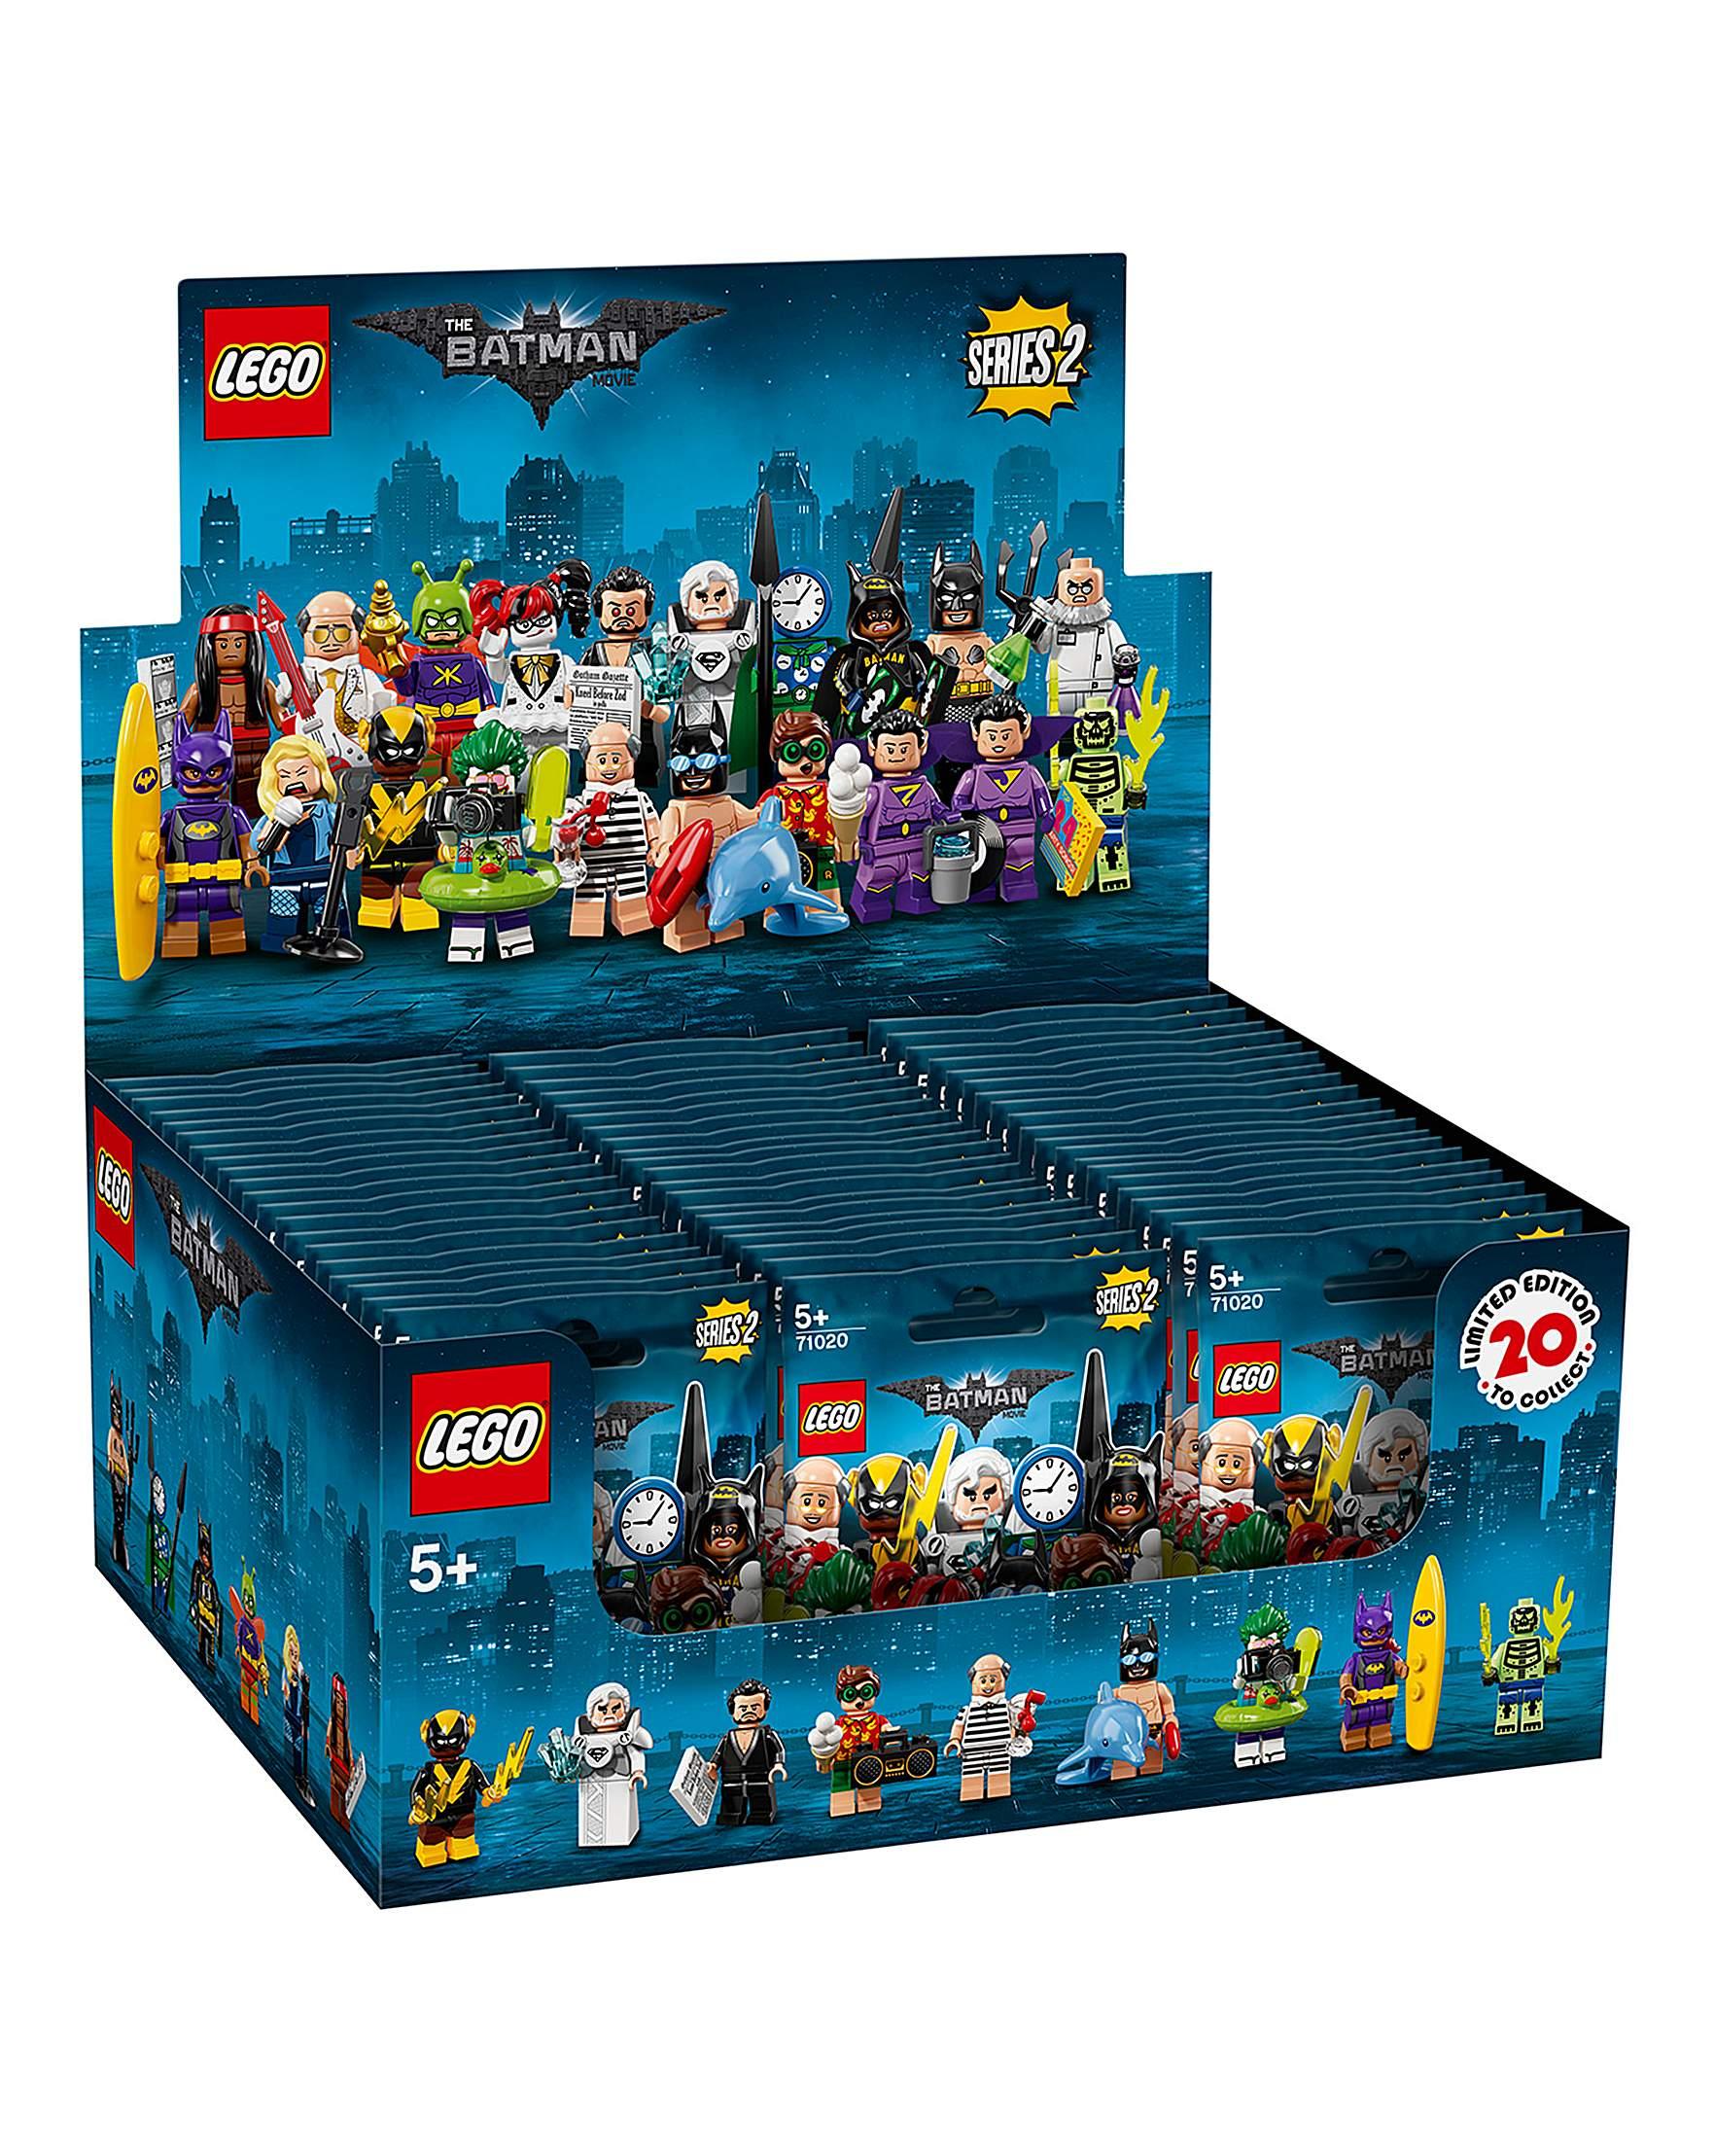 71020 The LEGO Batman Movie Series 2   Brickipedia   Fandom